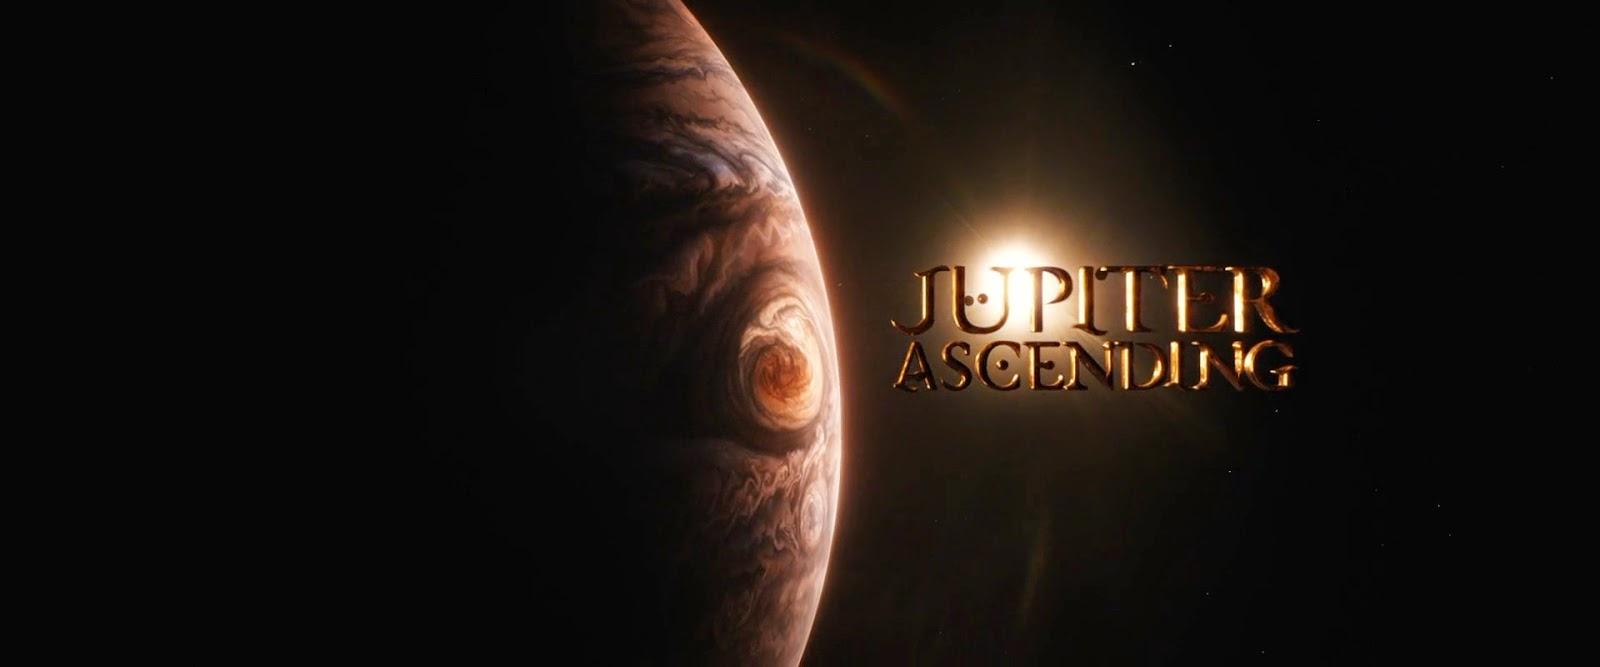 Jupiter Ascending (2015) 1080p S2 s Jupiter Ascending (2015) 1080p